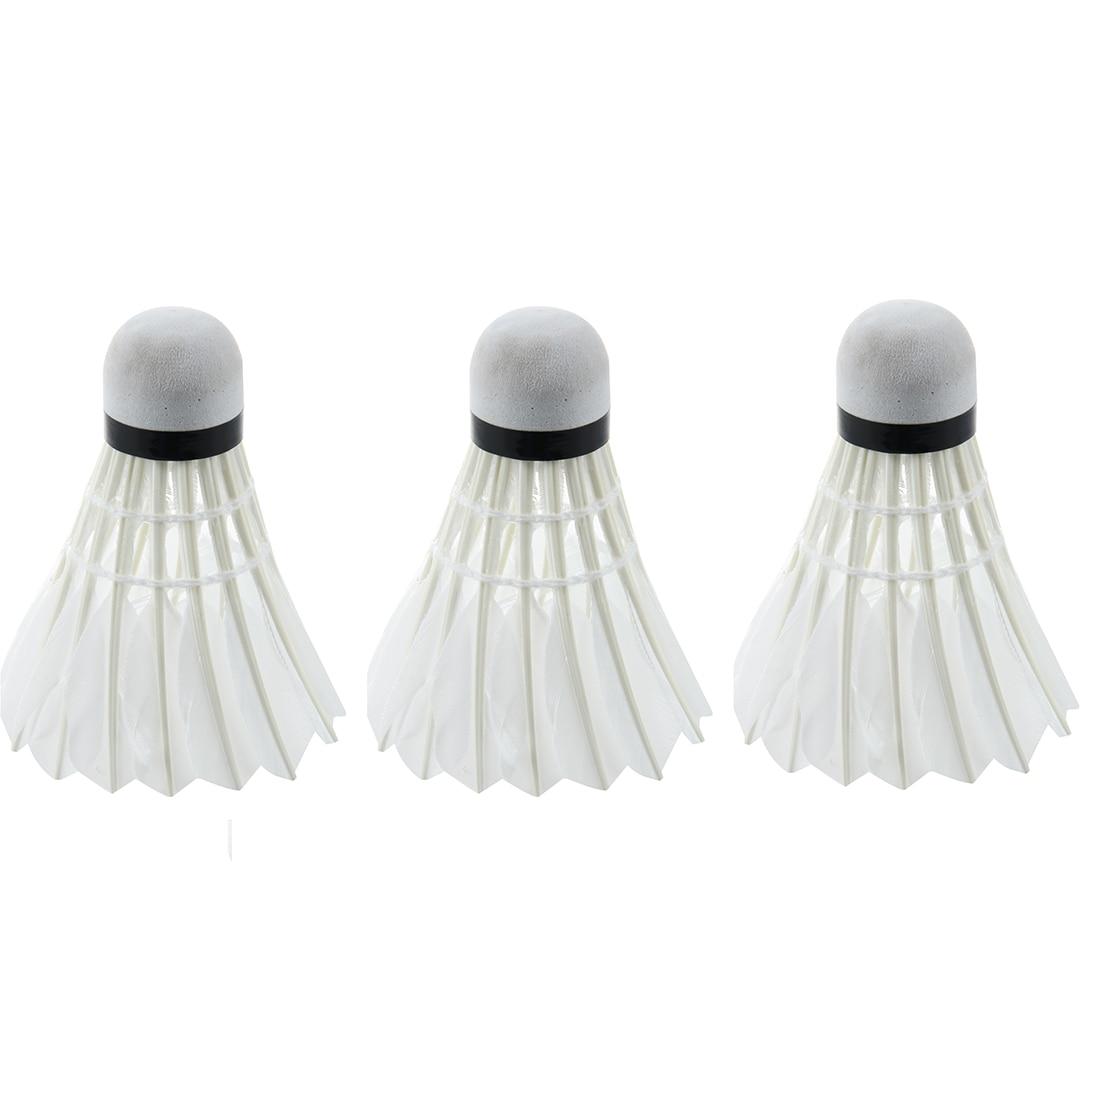 Dark Night LED Badminton Shuttlecock Birdies Lightingpack of 3) (red)